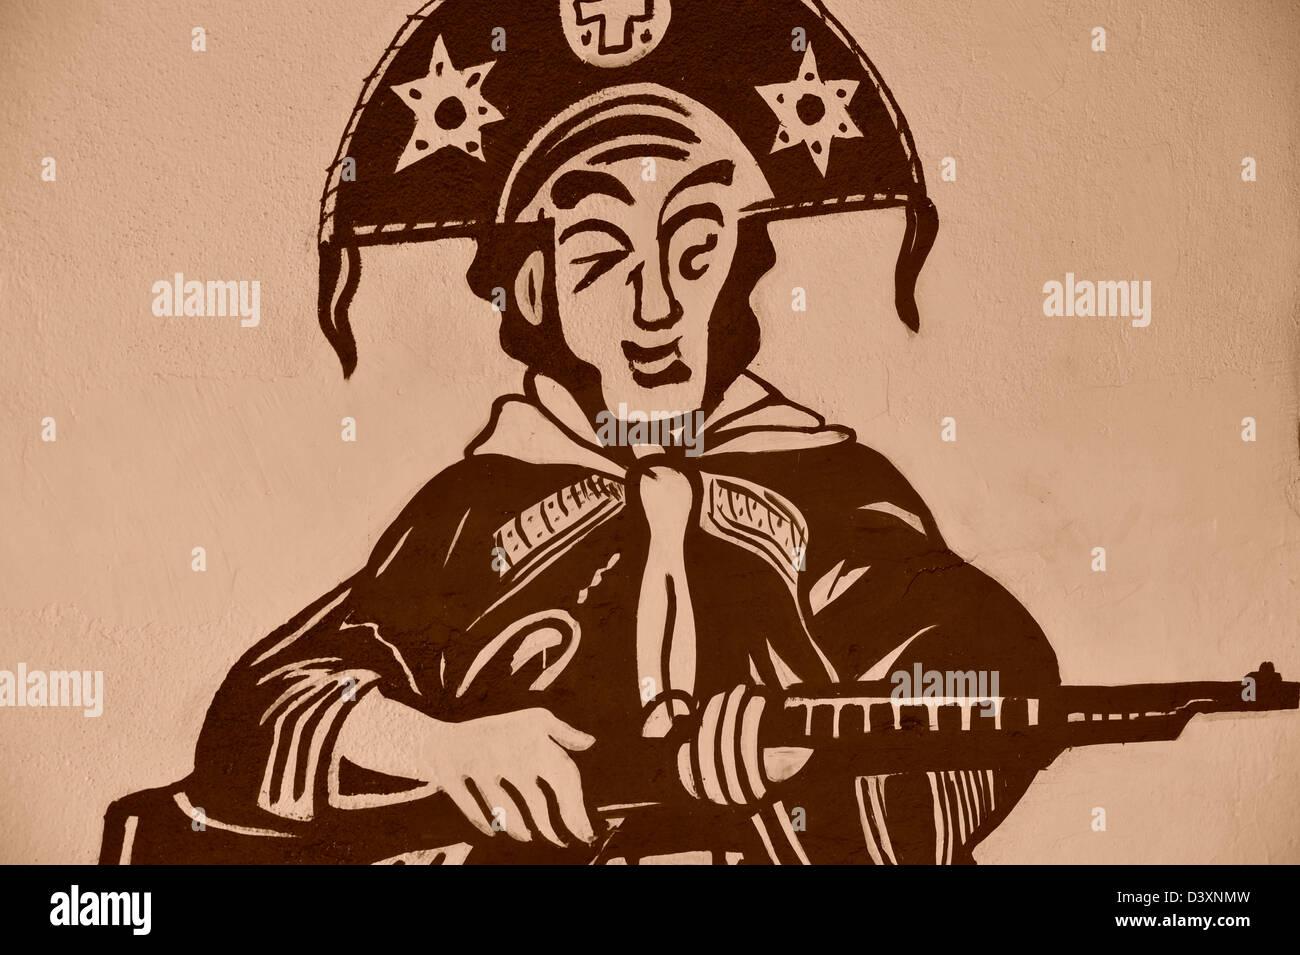 Wandgemälde des Berühmten Banditen Lampiáo - Held des Brasilianischen Nordostens Stockbild